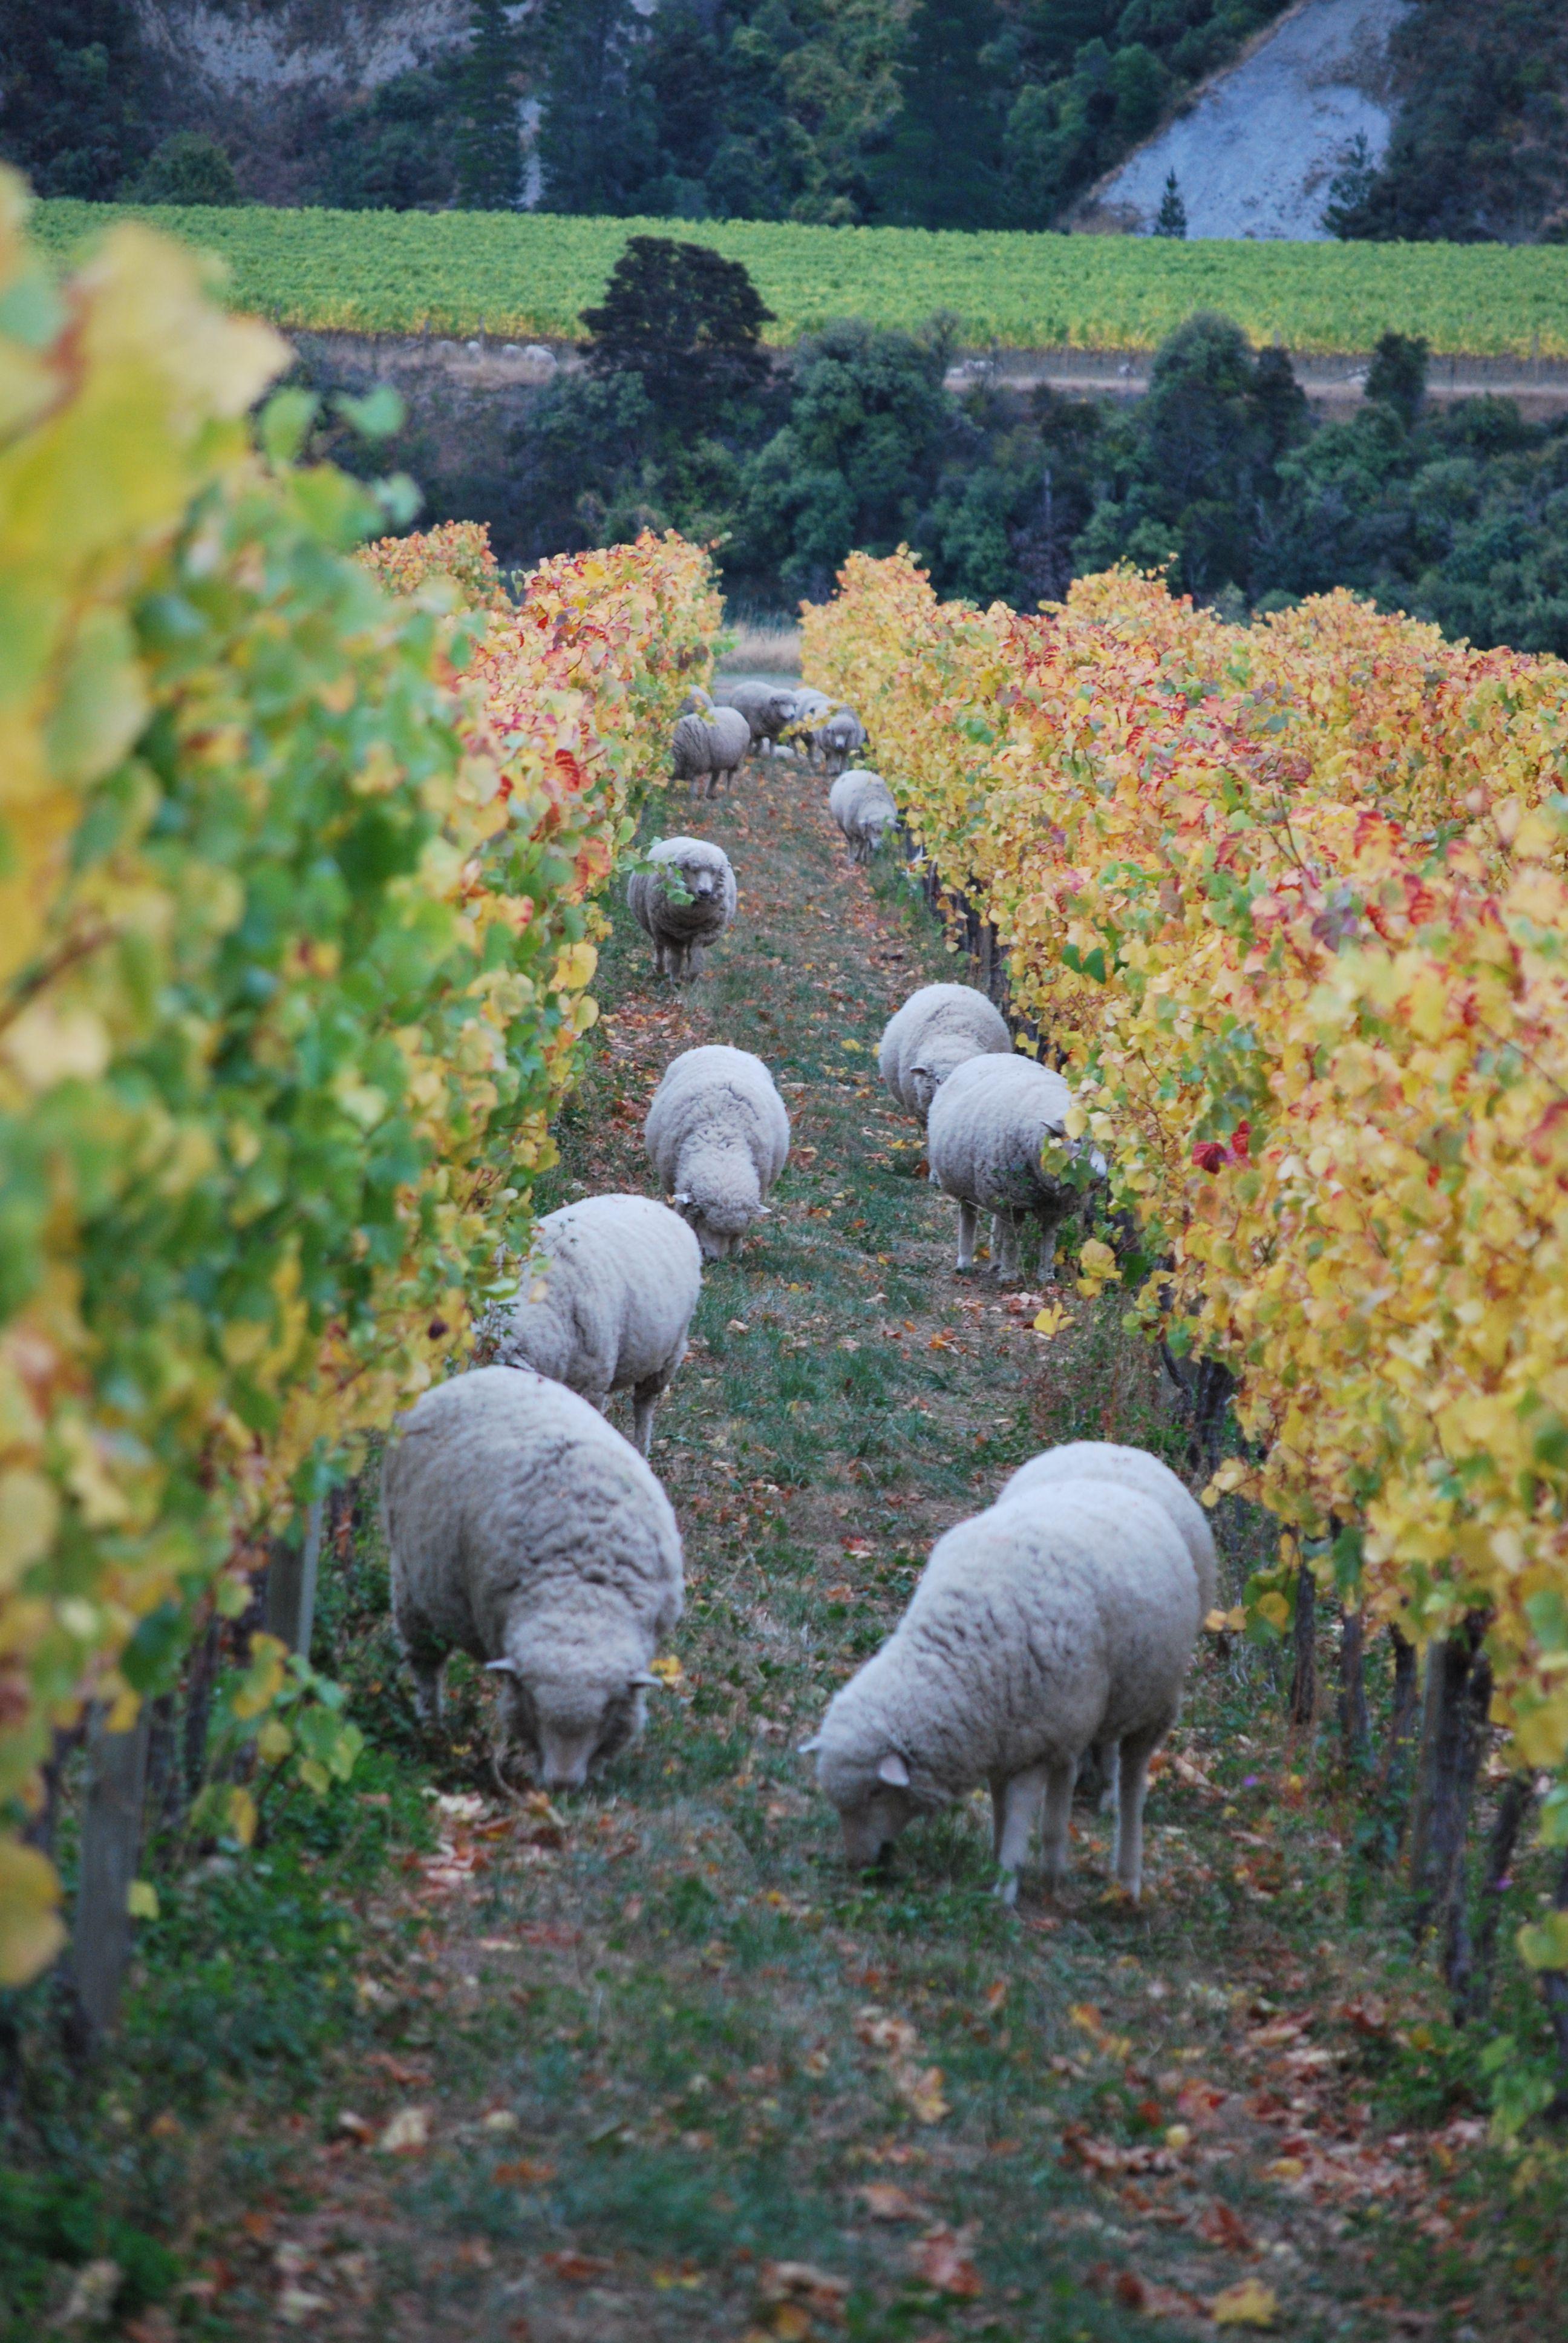 Visit loads of vineyards - learn about wine :) Ballochdale Estate Vineyard in Marlborough